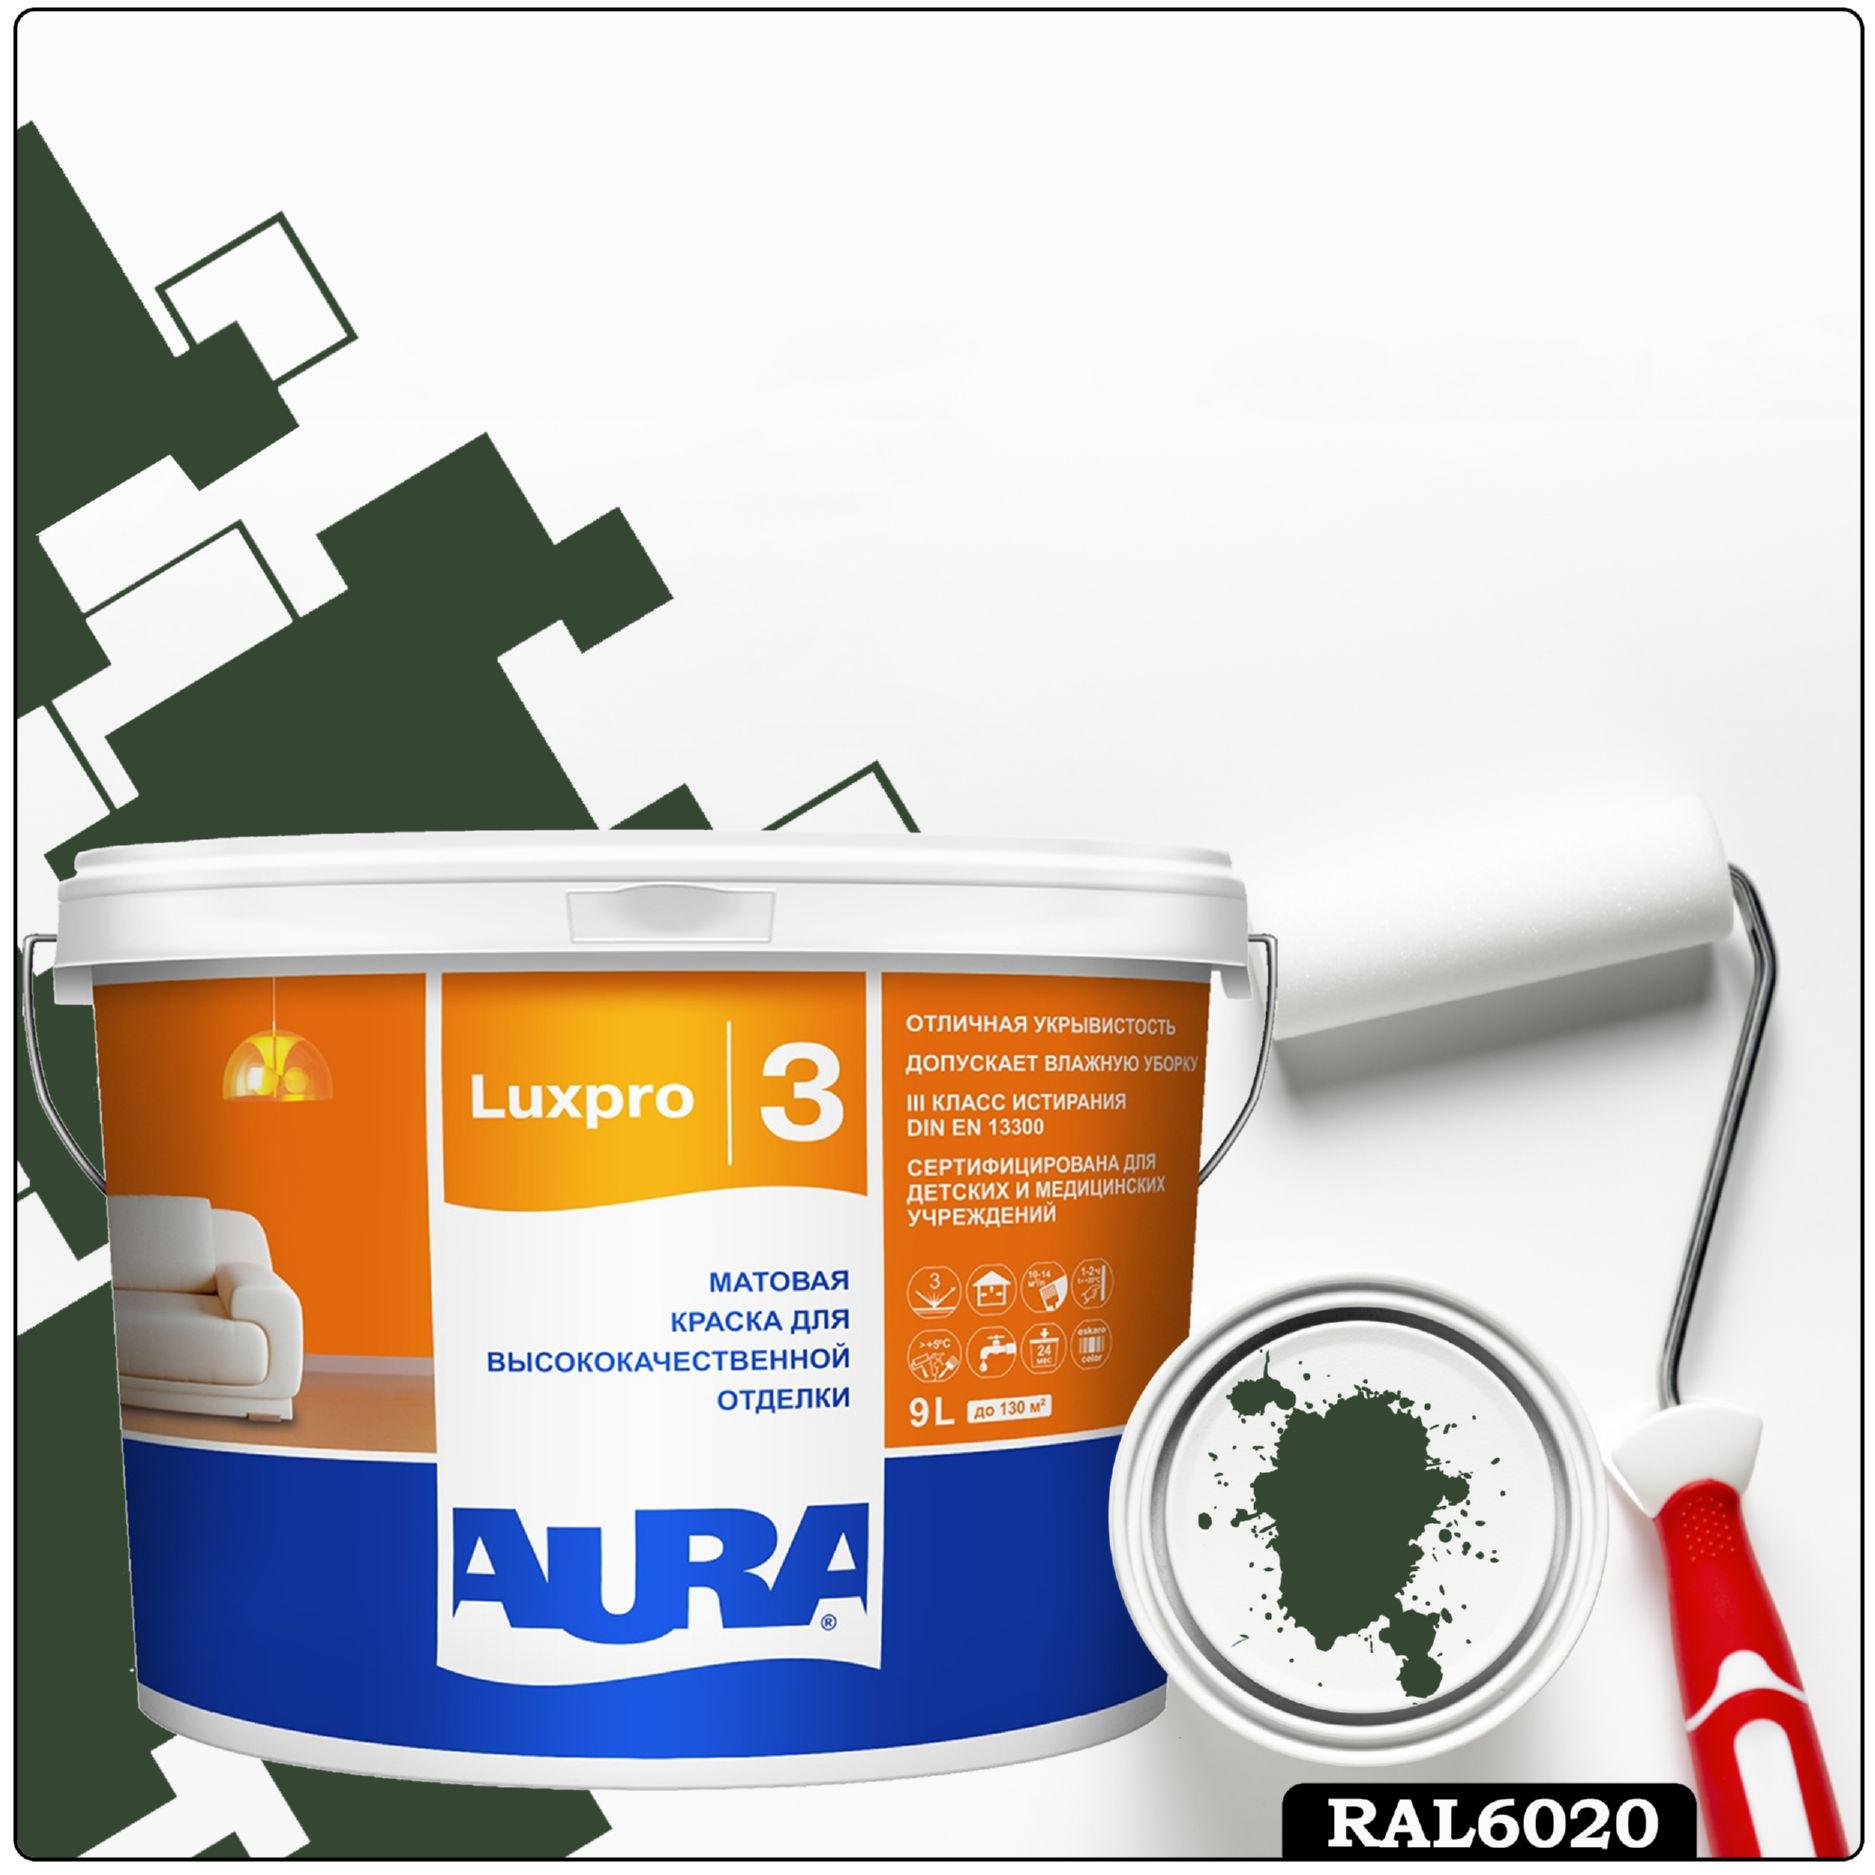 Фото 21 - Краска Aura LuxPRO 3, RAL 6020 Зеленый хром, латексная, шелково-матовая, интерьерная, 9л, Аура.